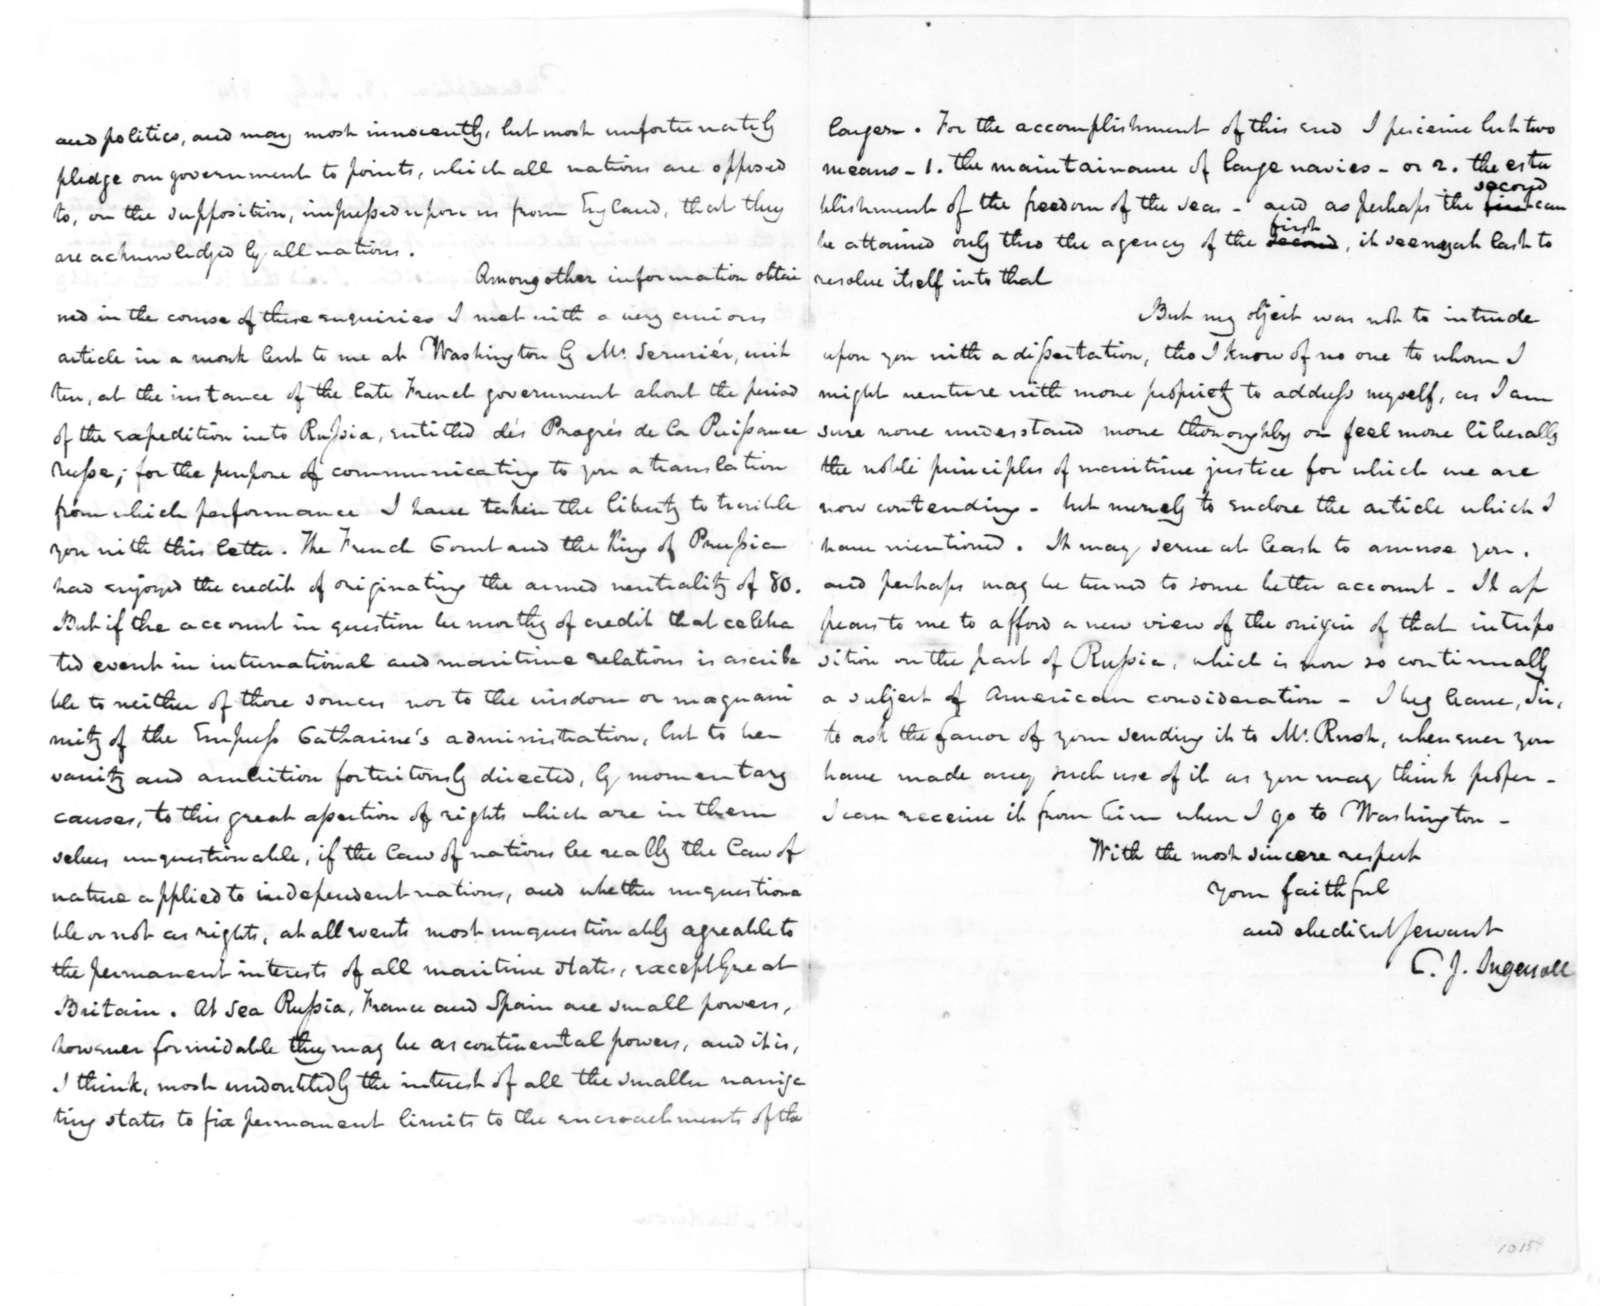 Charles J. Ingersoll to James Madison, July 18, 1814.